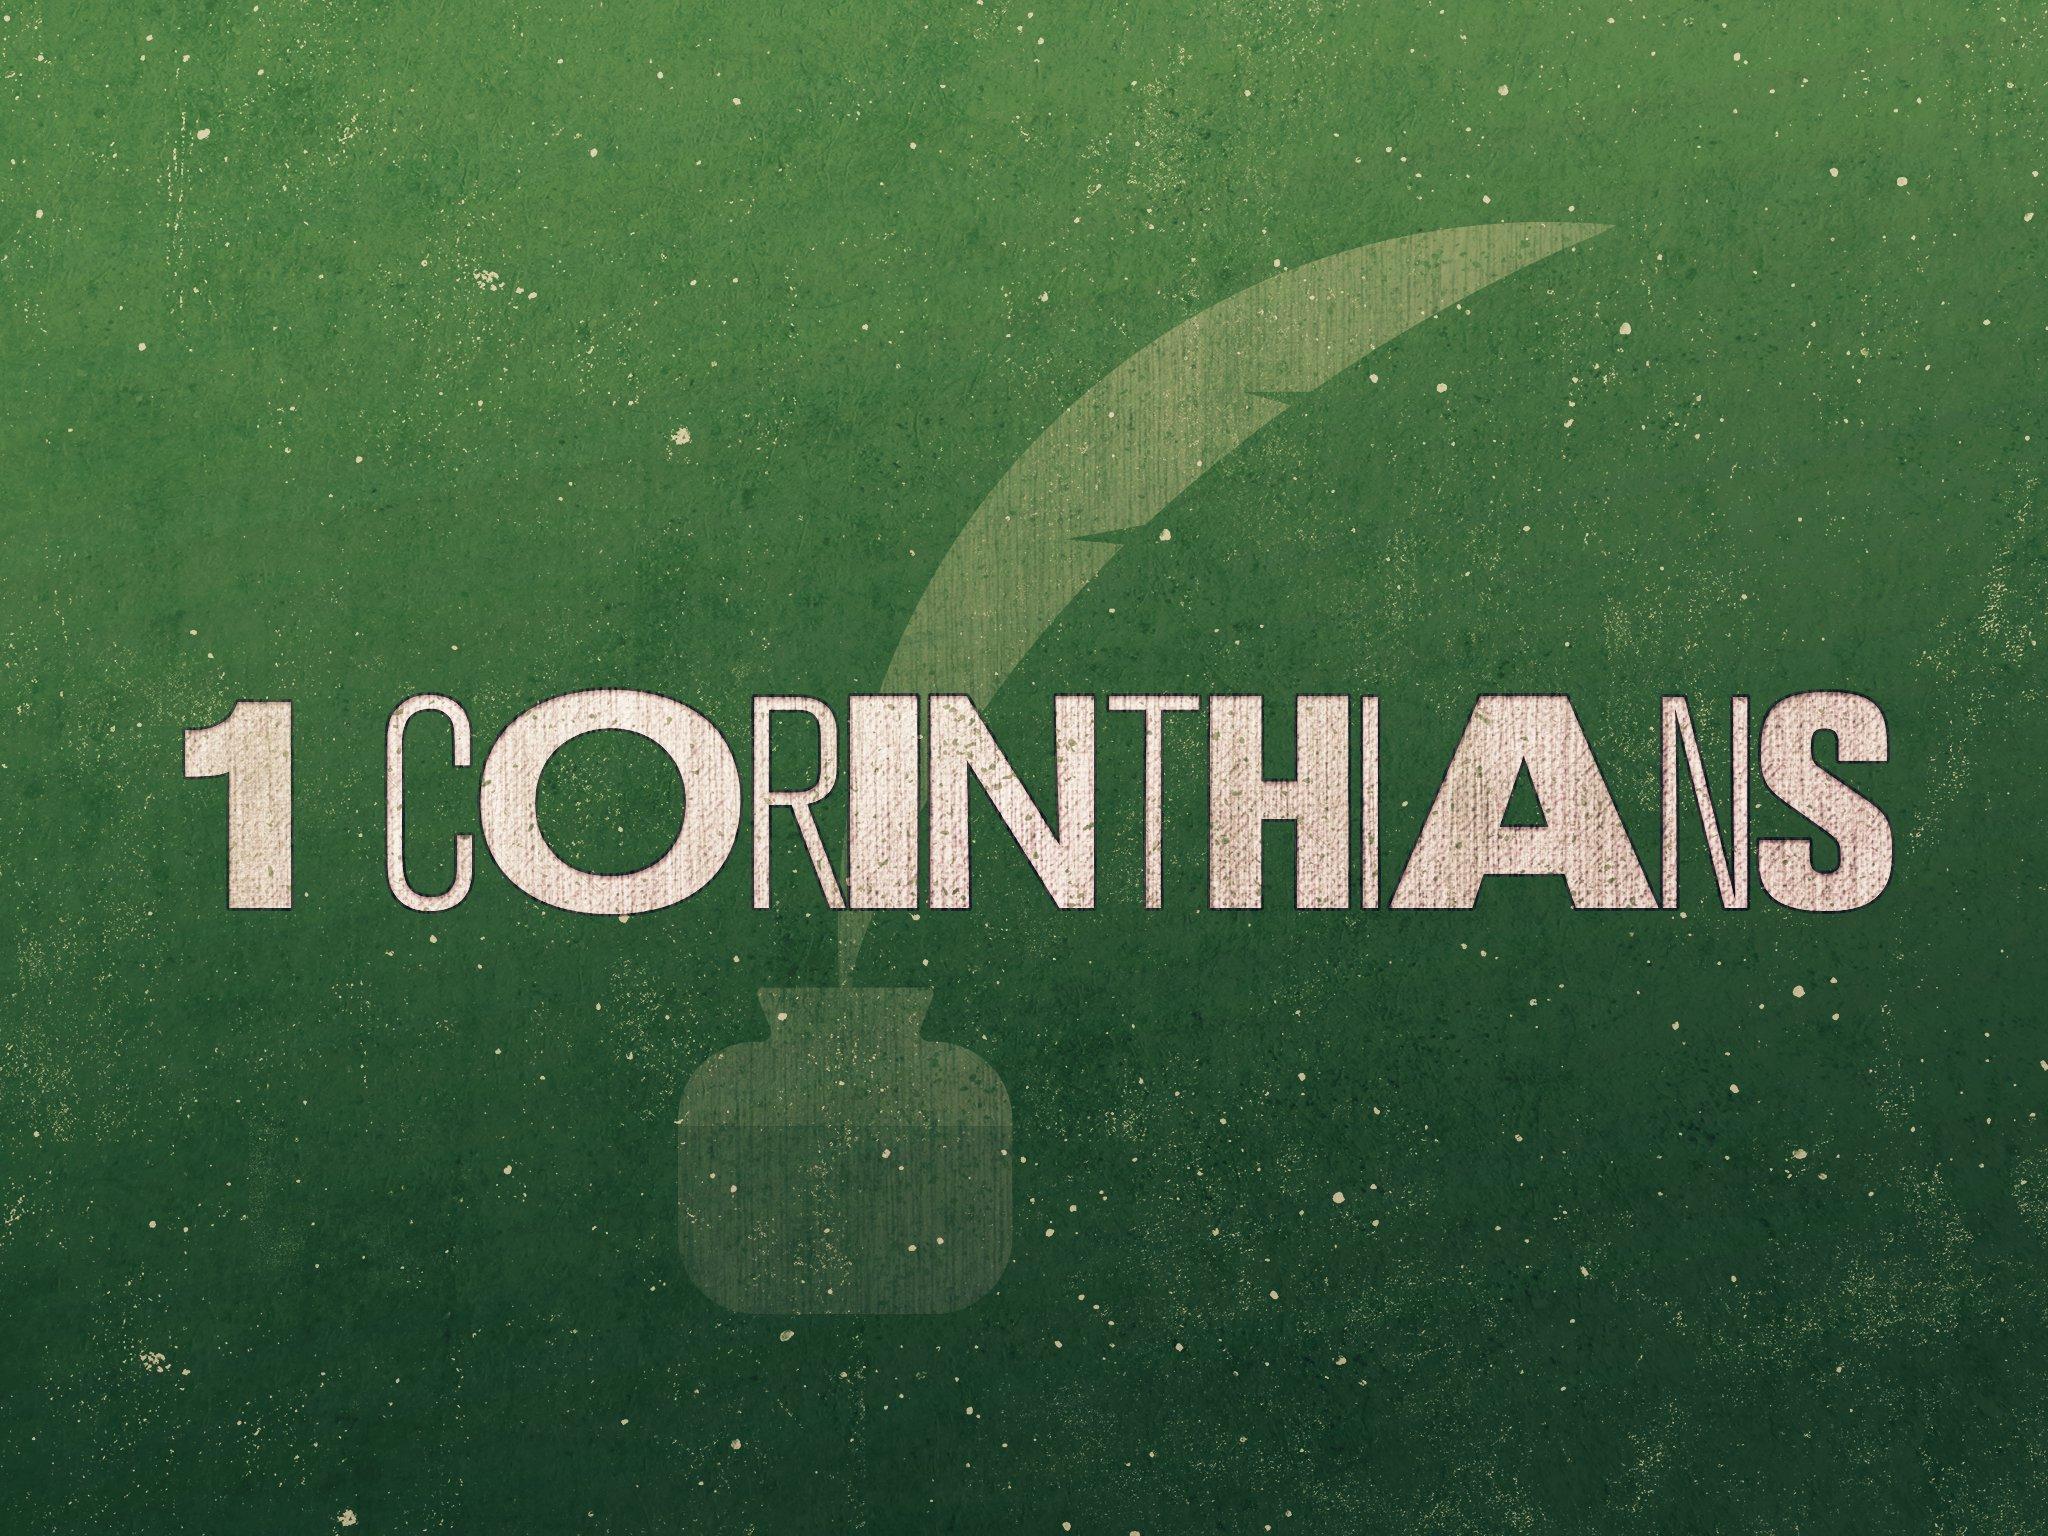 46-1-Corinthians_Title_4x3-fullscreen.jpg